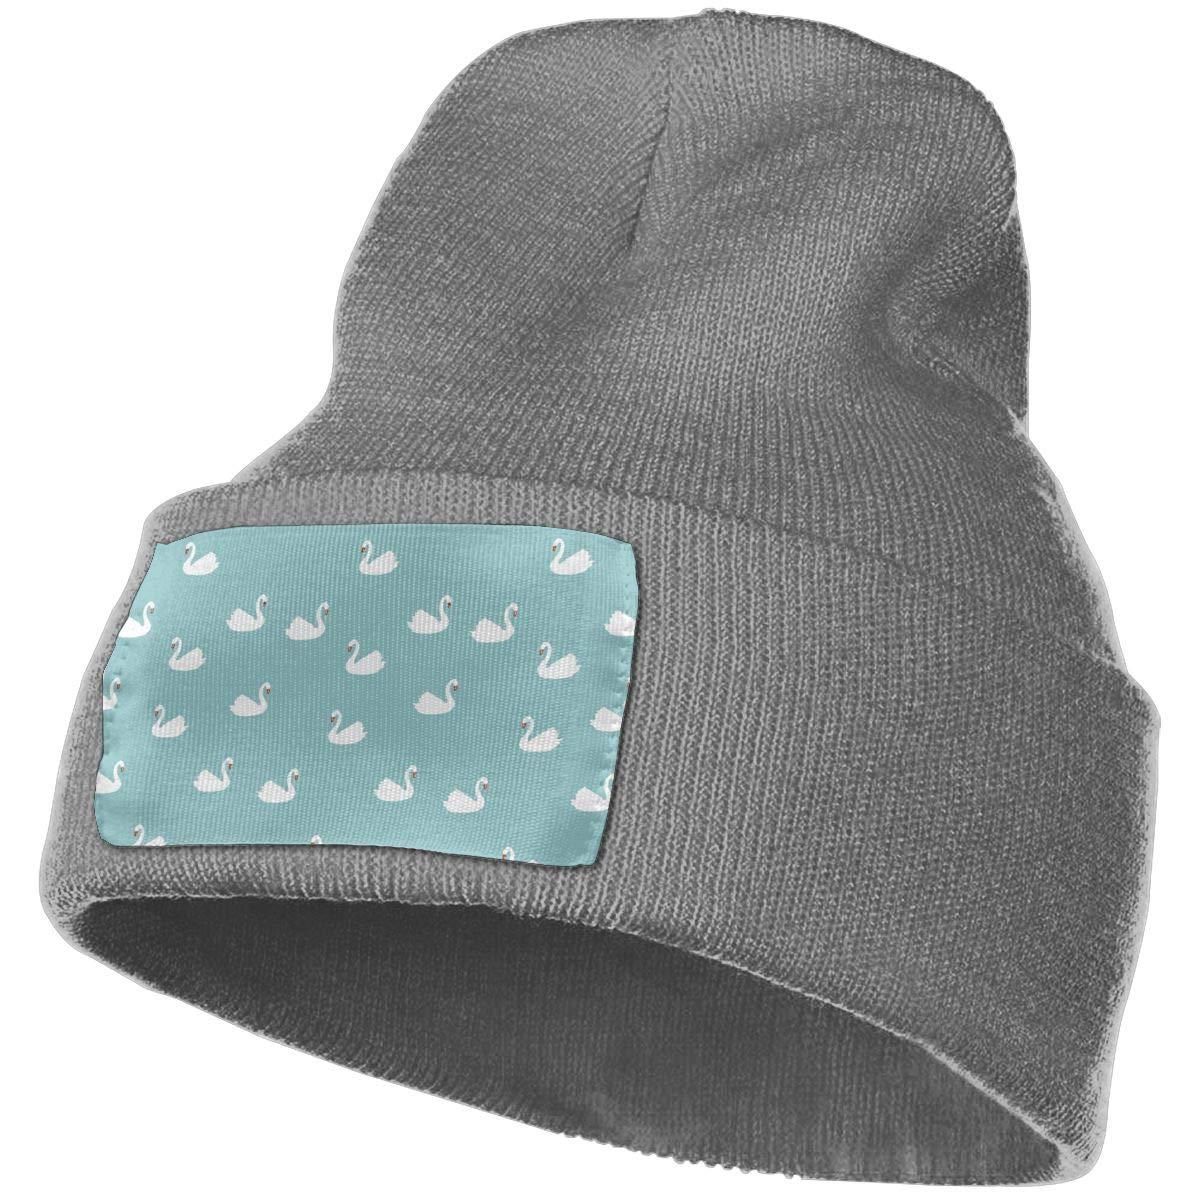 Yubb7E Swan Warm Knit Winter Solid Beanie Hat Unisex Skull Cap